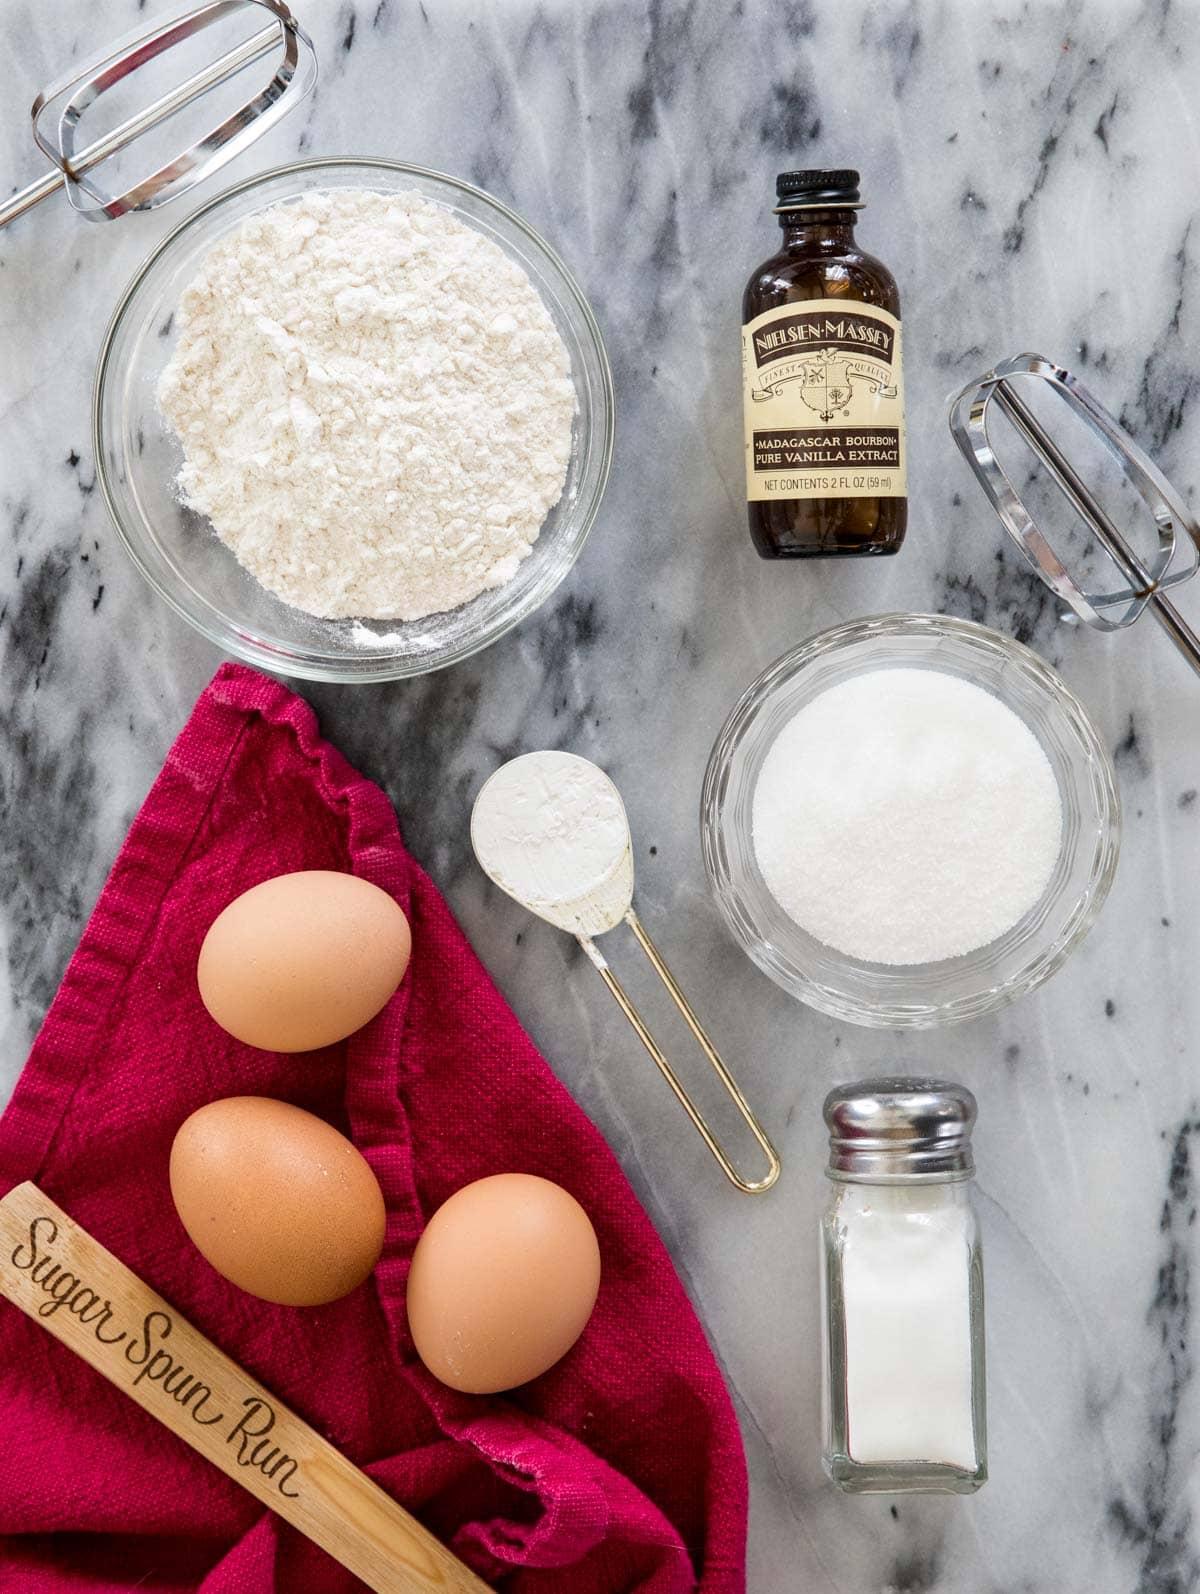 Ingredients for ladyfingers: flour, vanilla, cornstarch, granulated sugar, eggs, salt